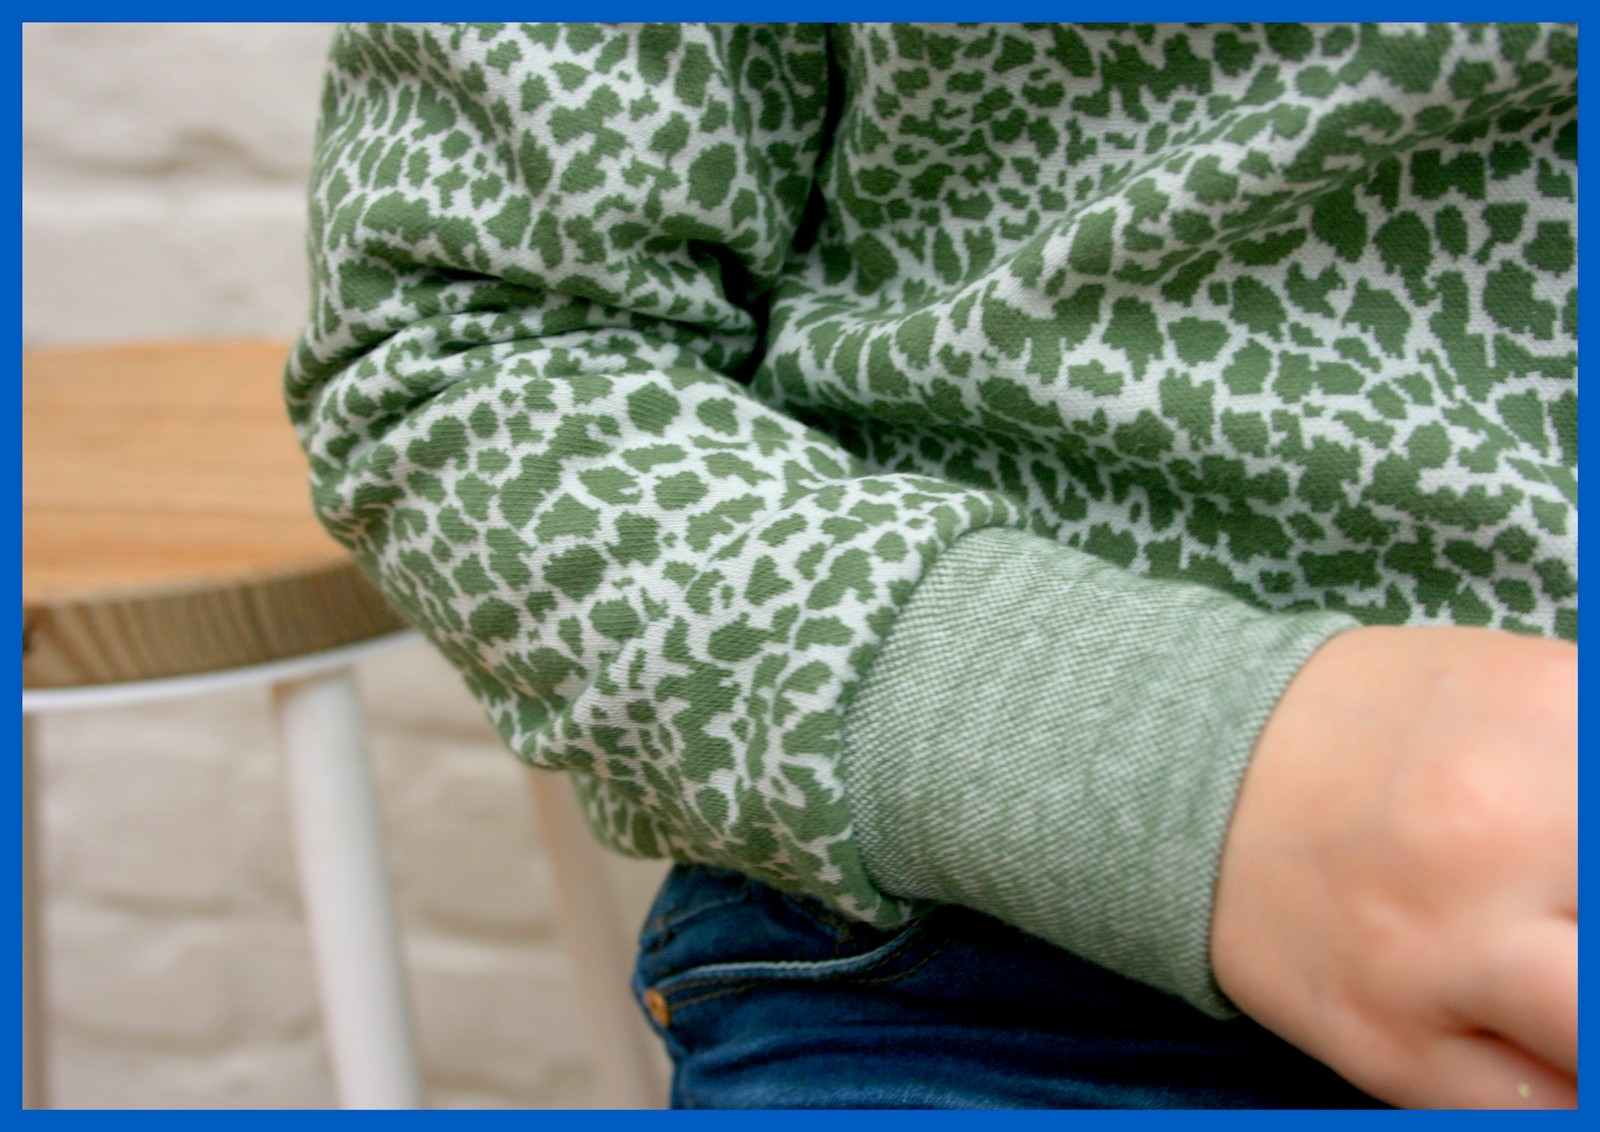 sweater x 3 (hoodie SVDHZ1 - sleeve)